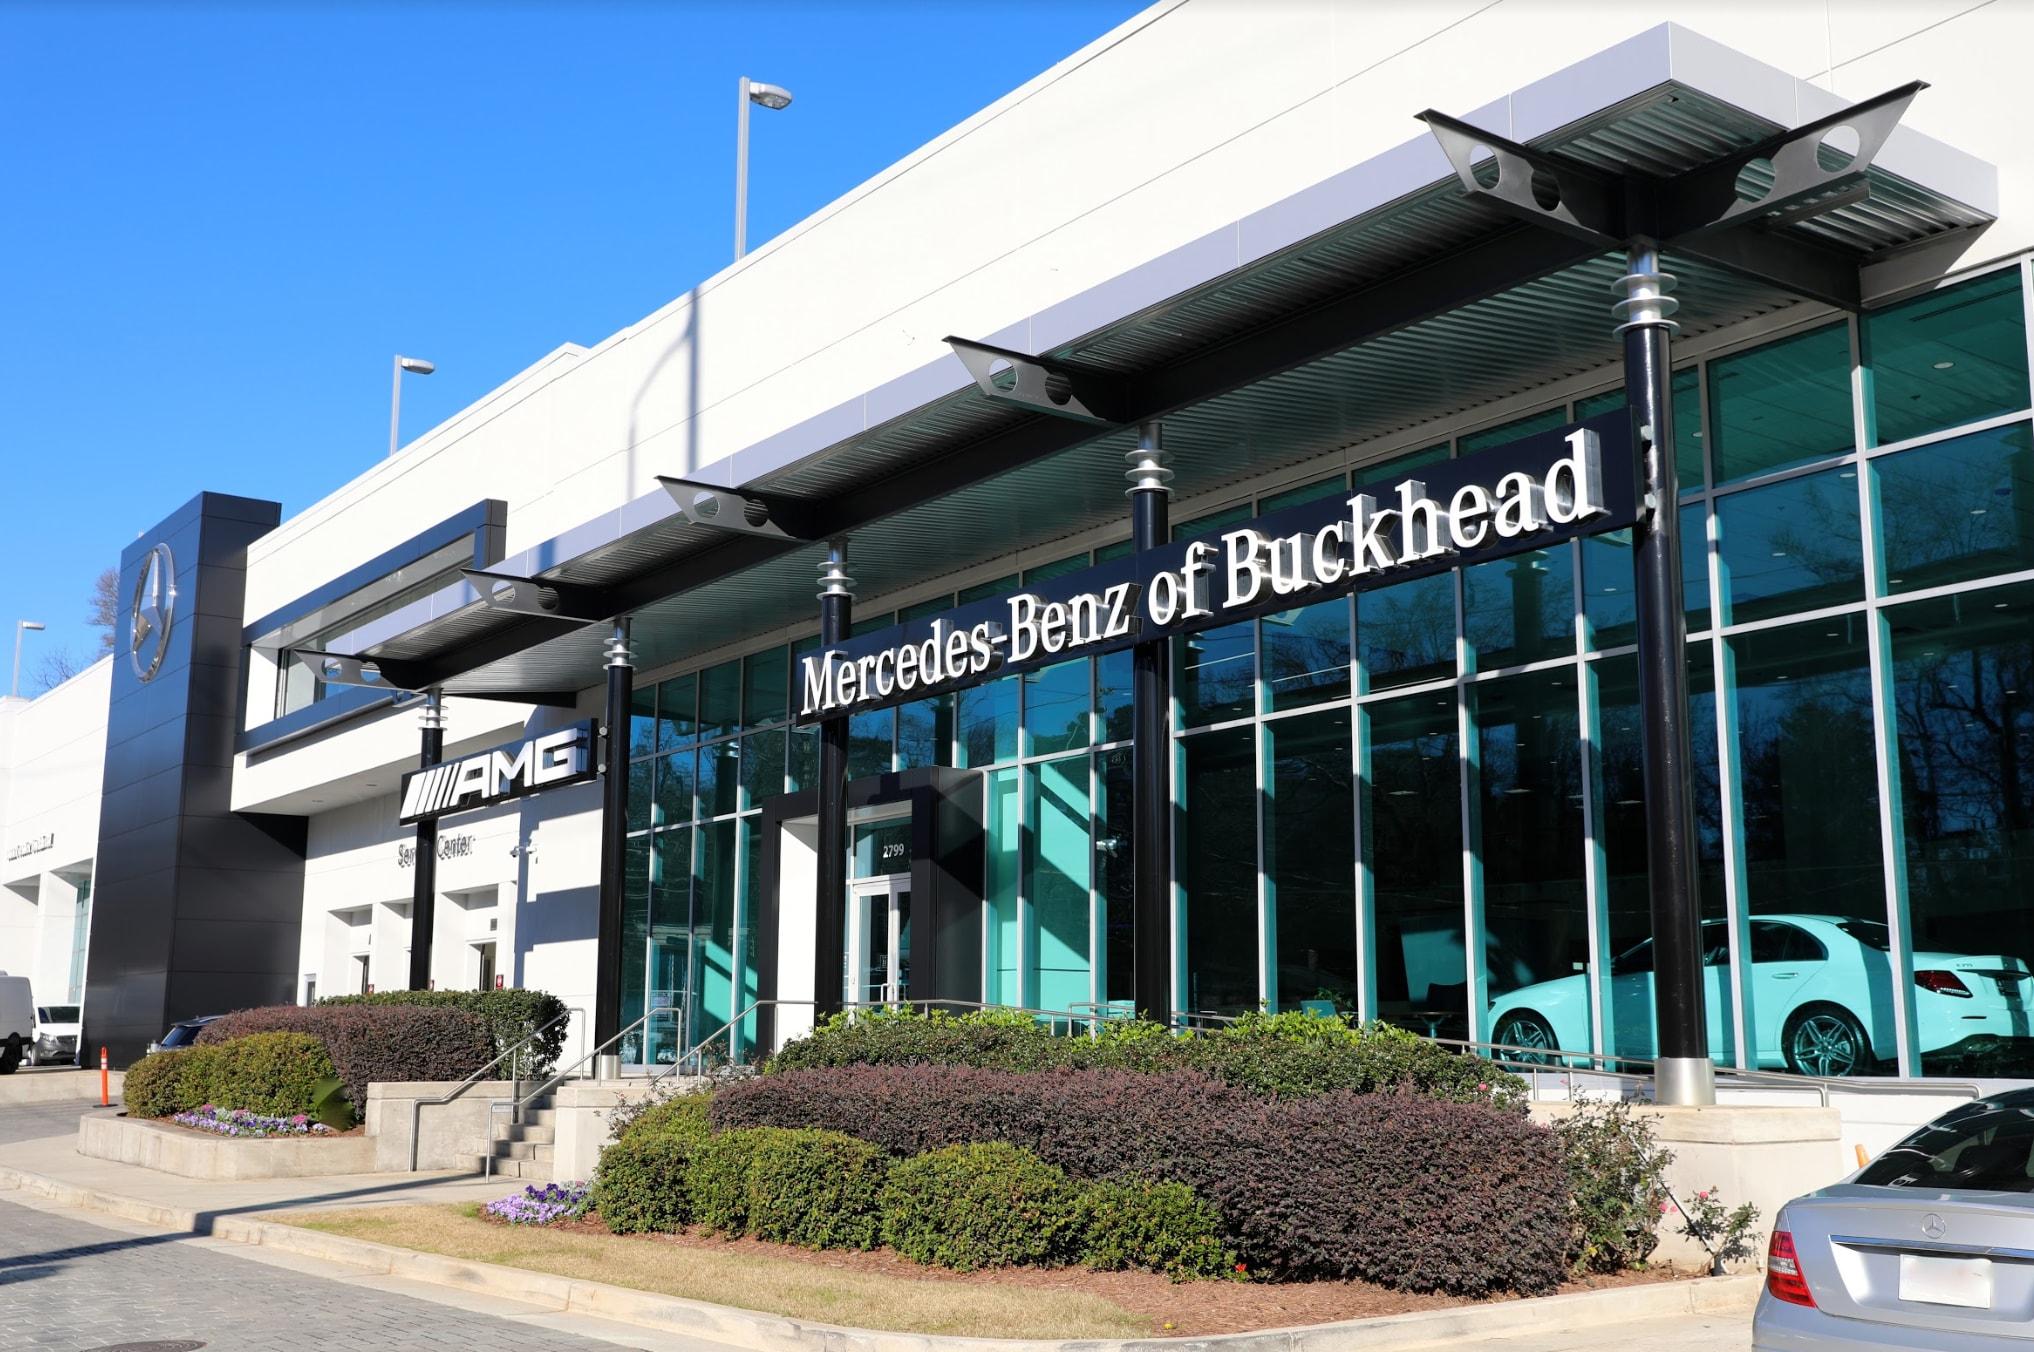 Mercedes Benz Dealership >> Mercedes Benz Of Buckhead New And Used Mercedes Benz